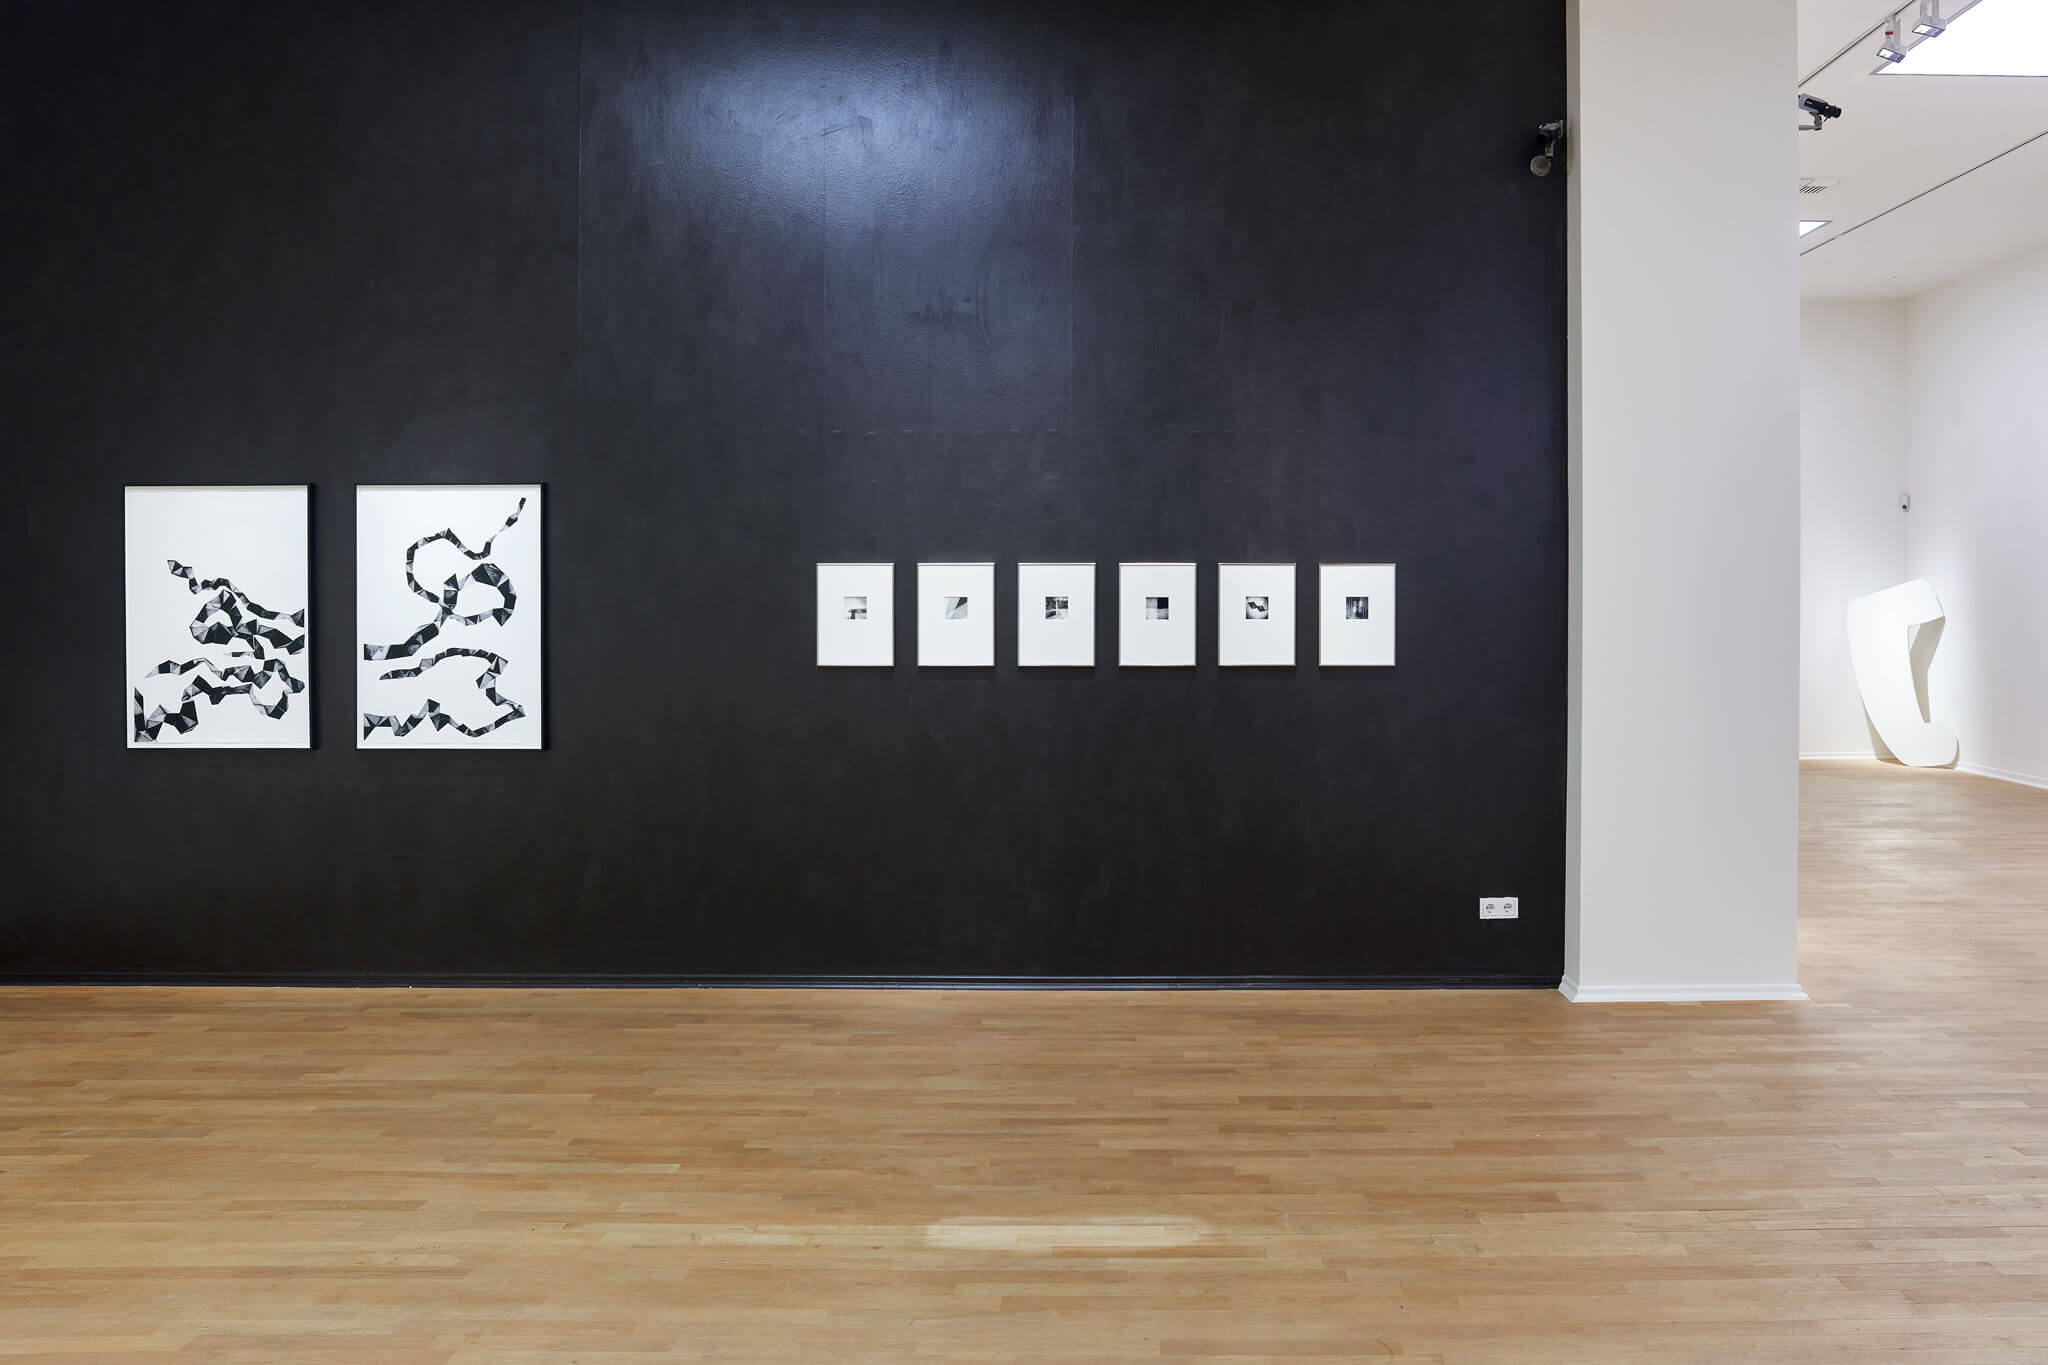 07_Frauke Dannert_Collage_Installation_Museum Kunstpalast_2016